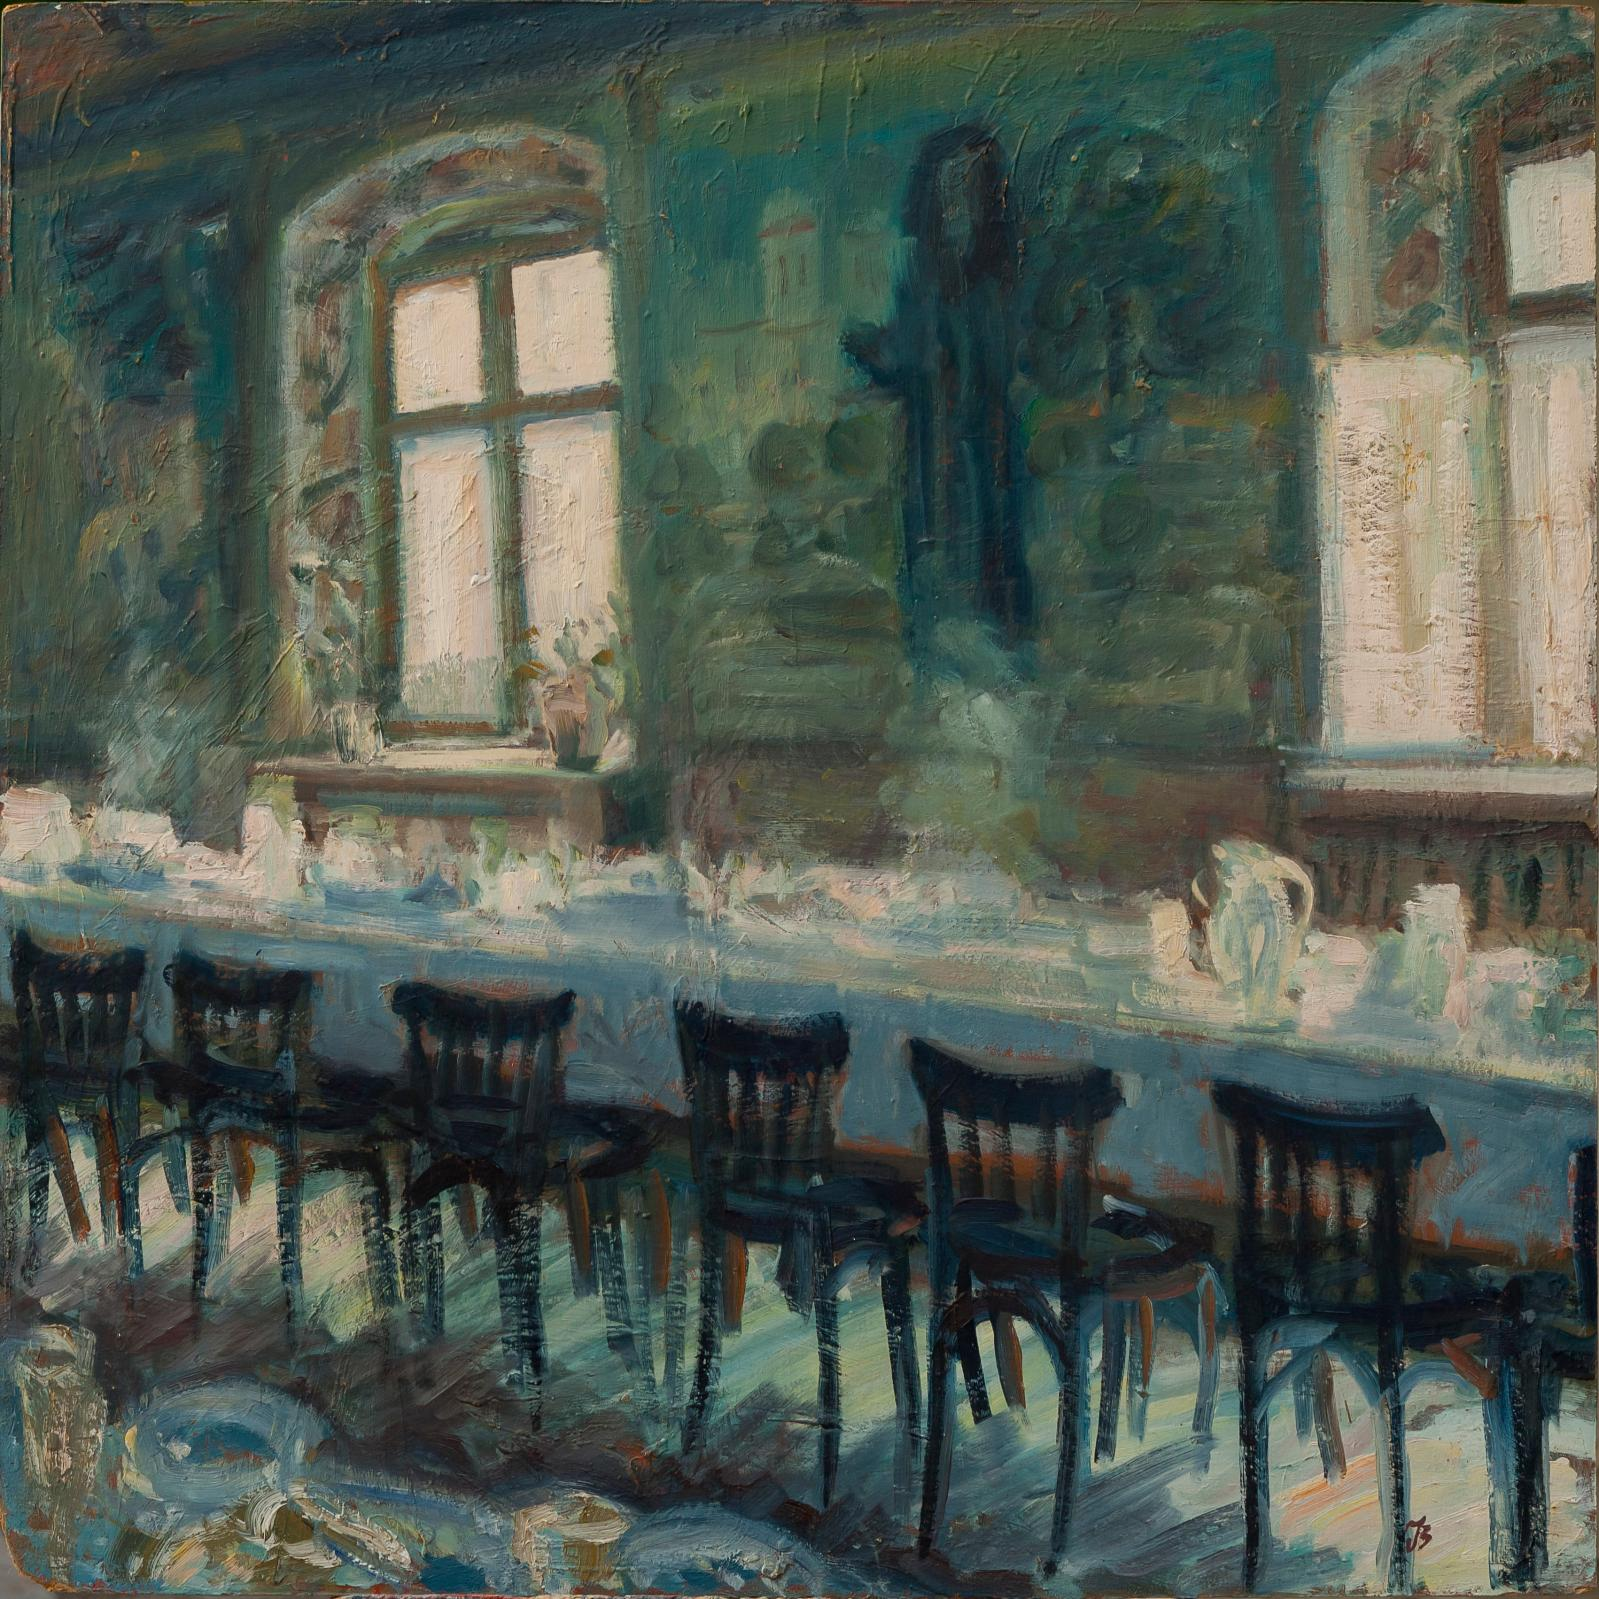 Ioana Batranu, Banquet, 2003, huile sur bois (détail). Courtesy Ovidiu Sandor Collection